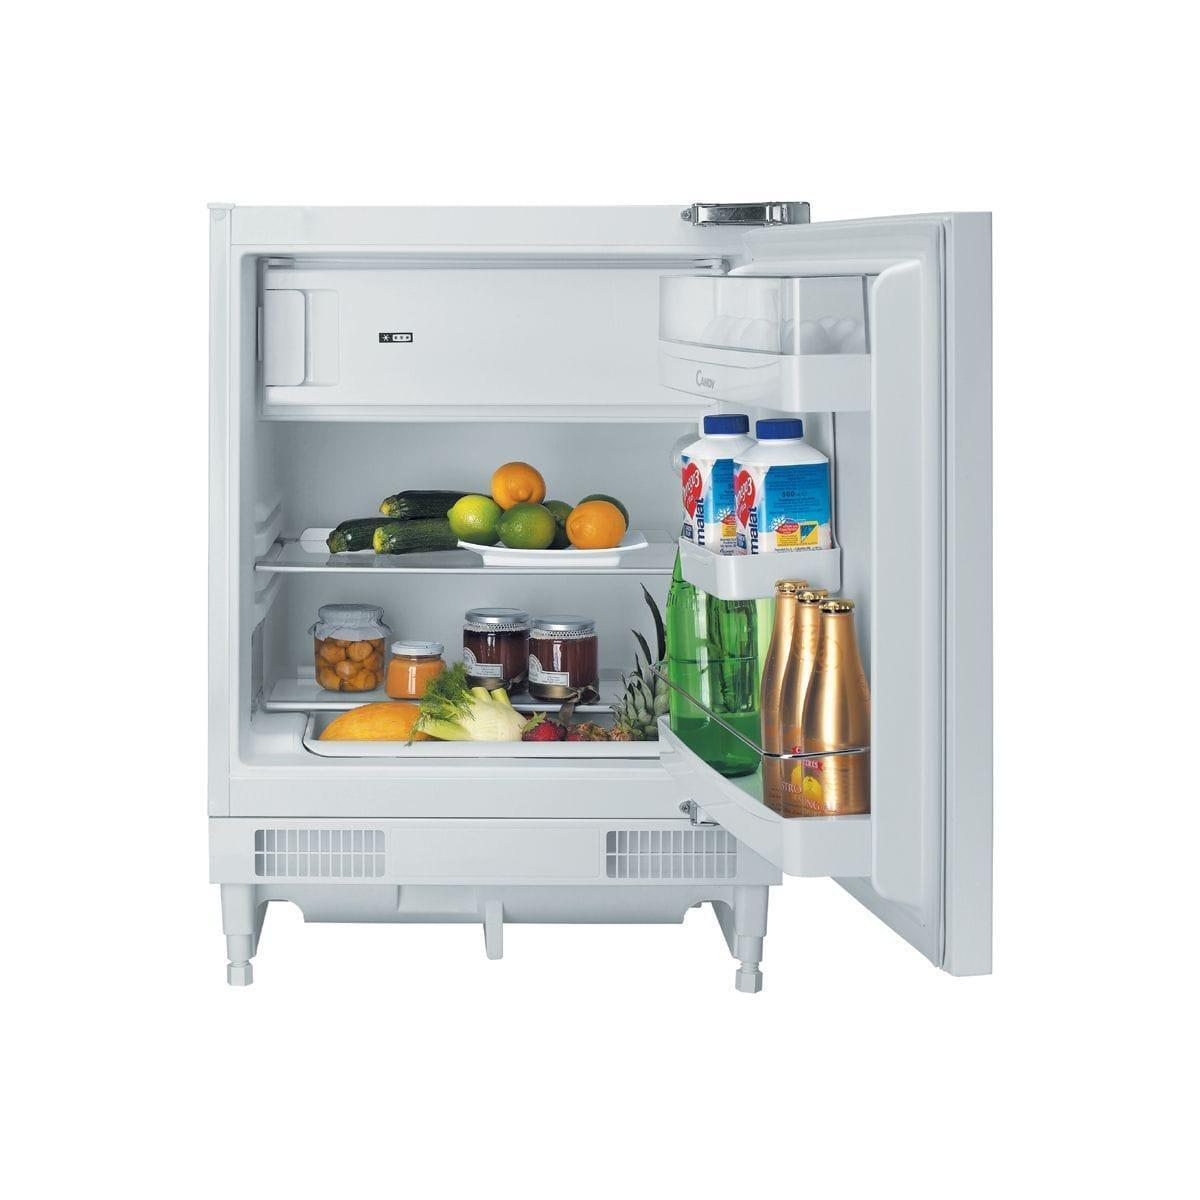 Réfrigérateur top Candy CRU164E